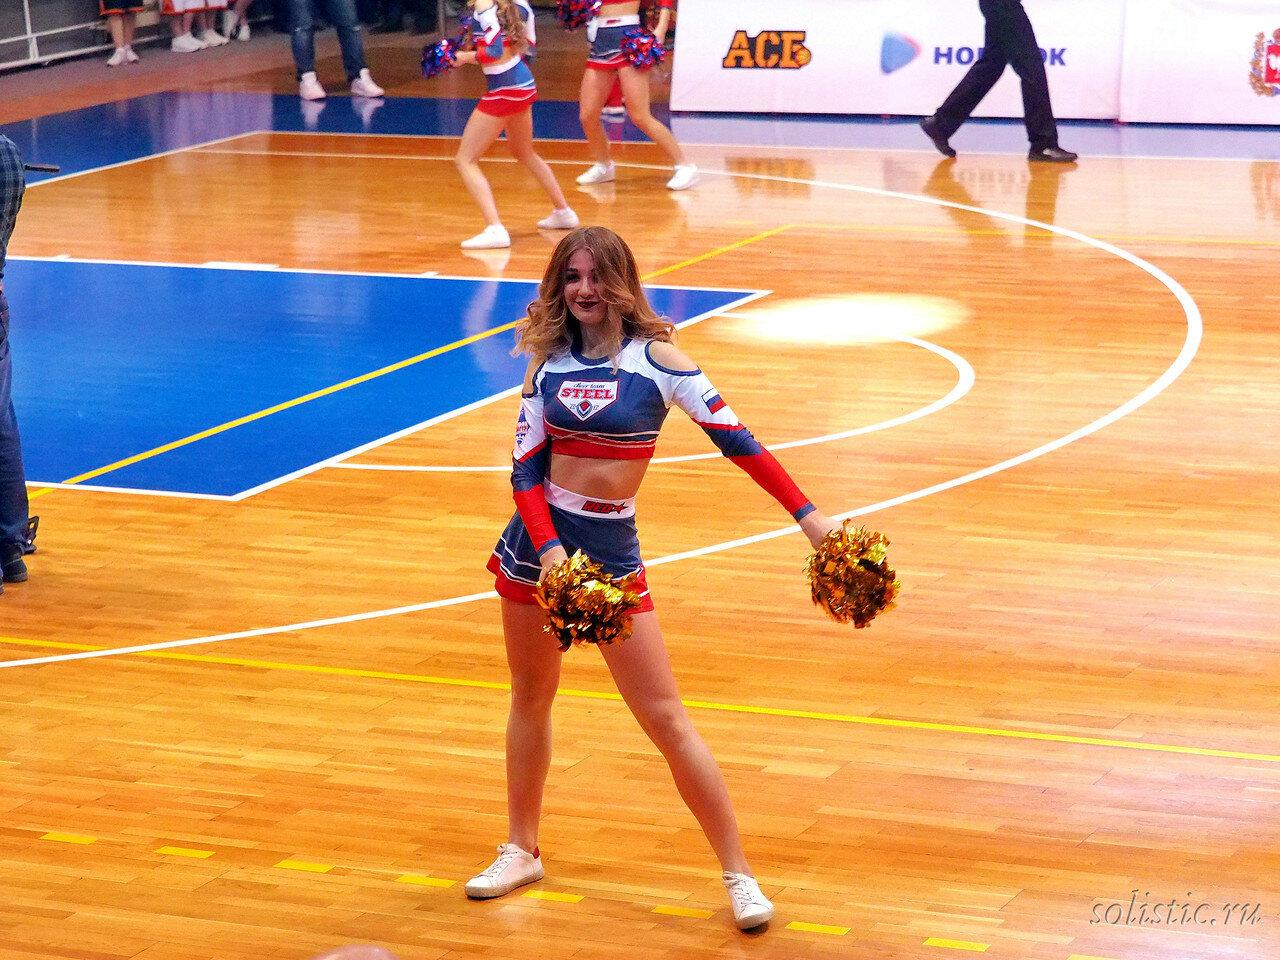 139 Матч звезд АСБ 2018 (ассоциации студенческого баскетбола)